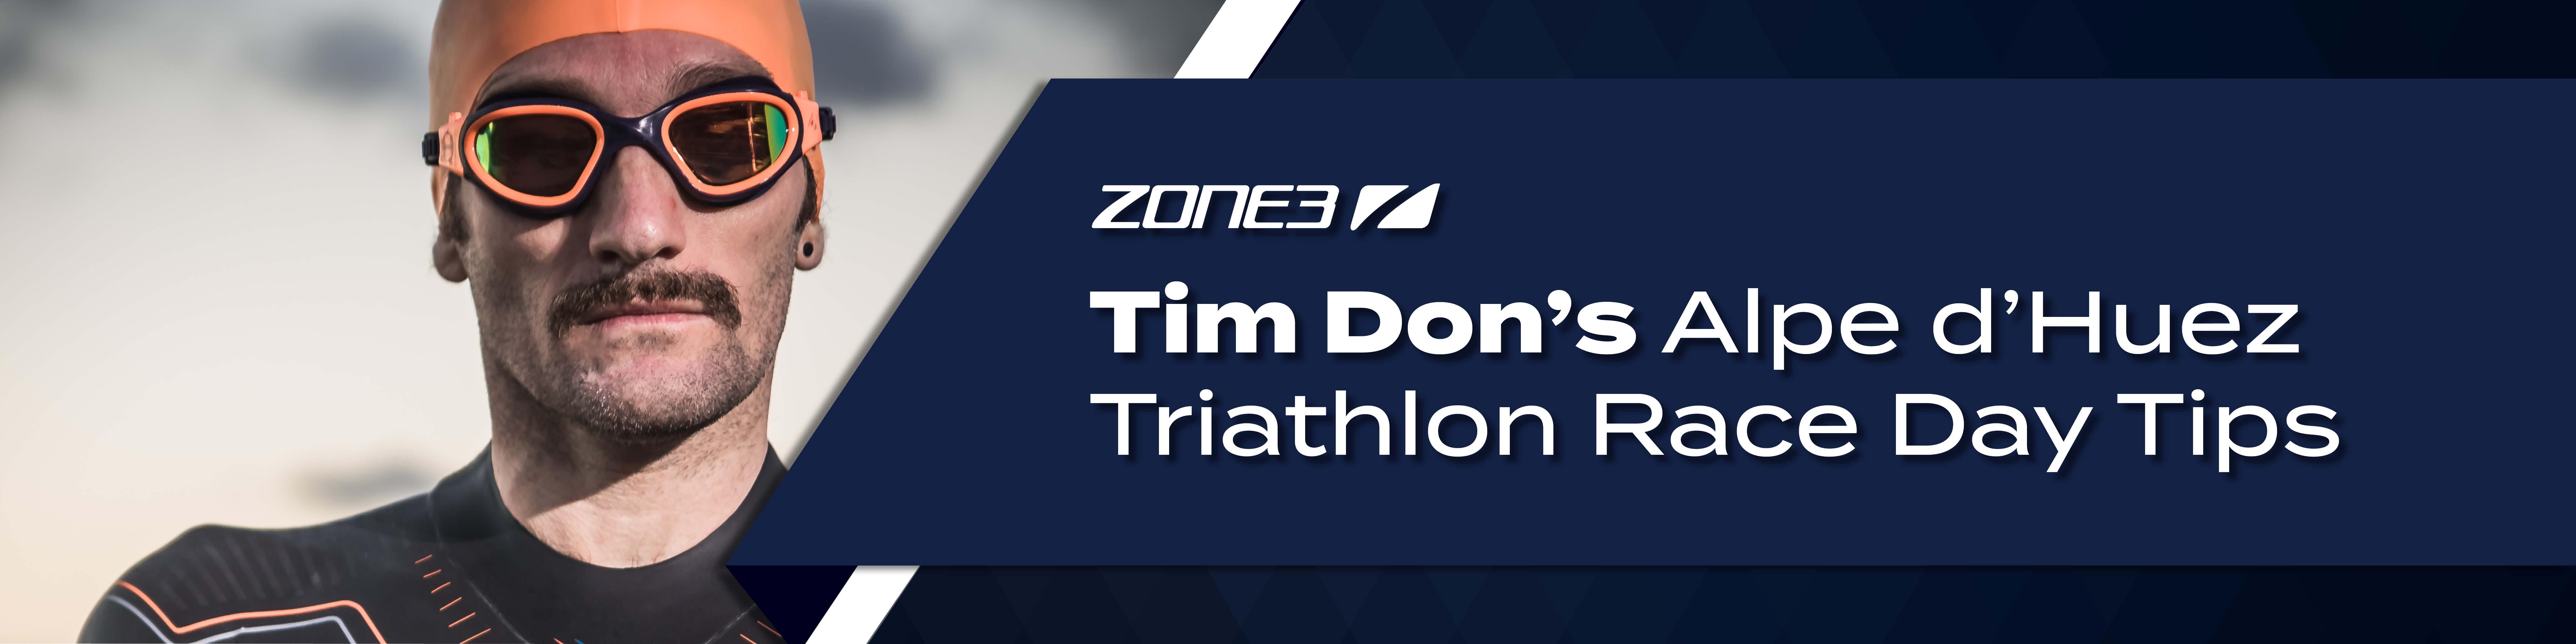 TIM DON Alpe d'Huez Triathlon Zone3